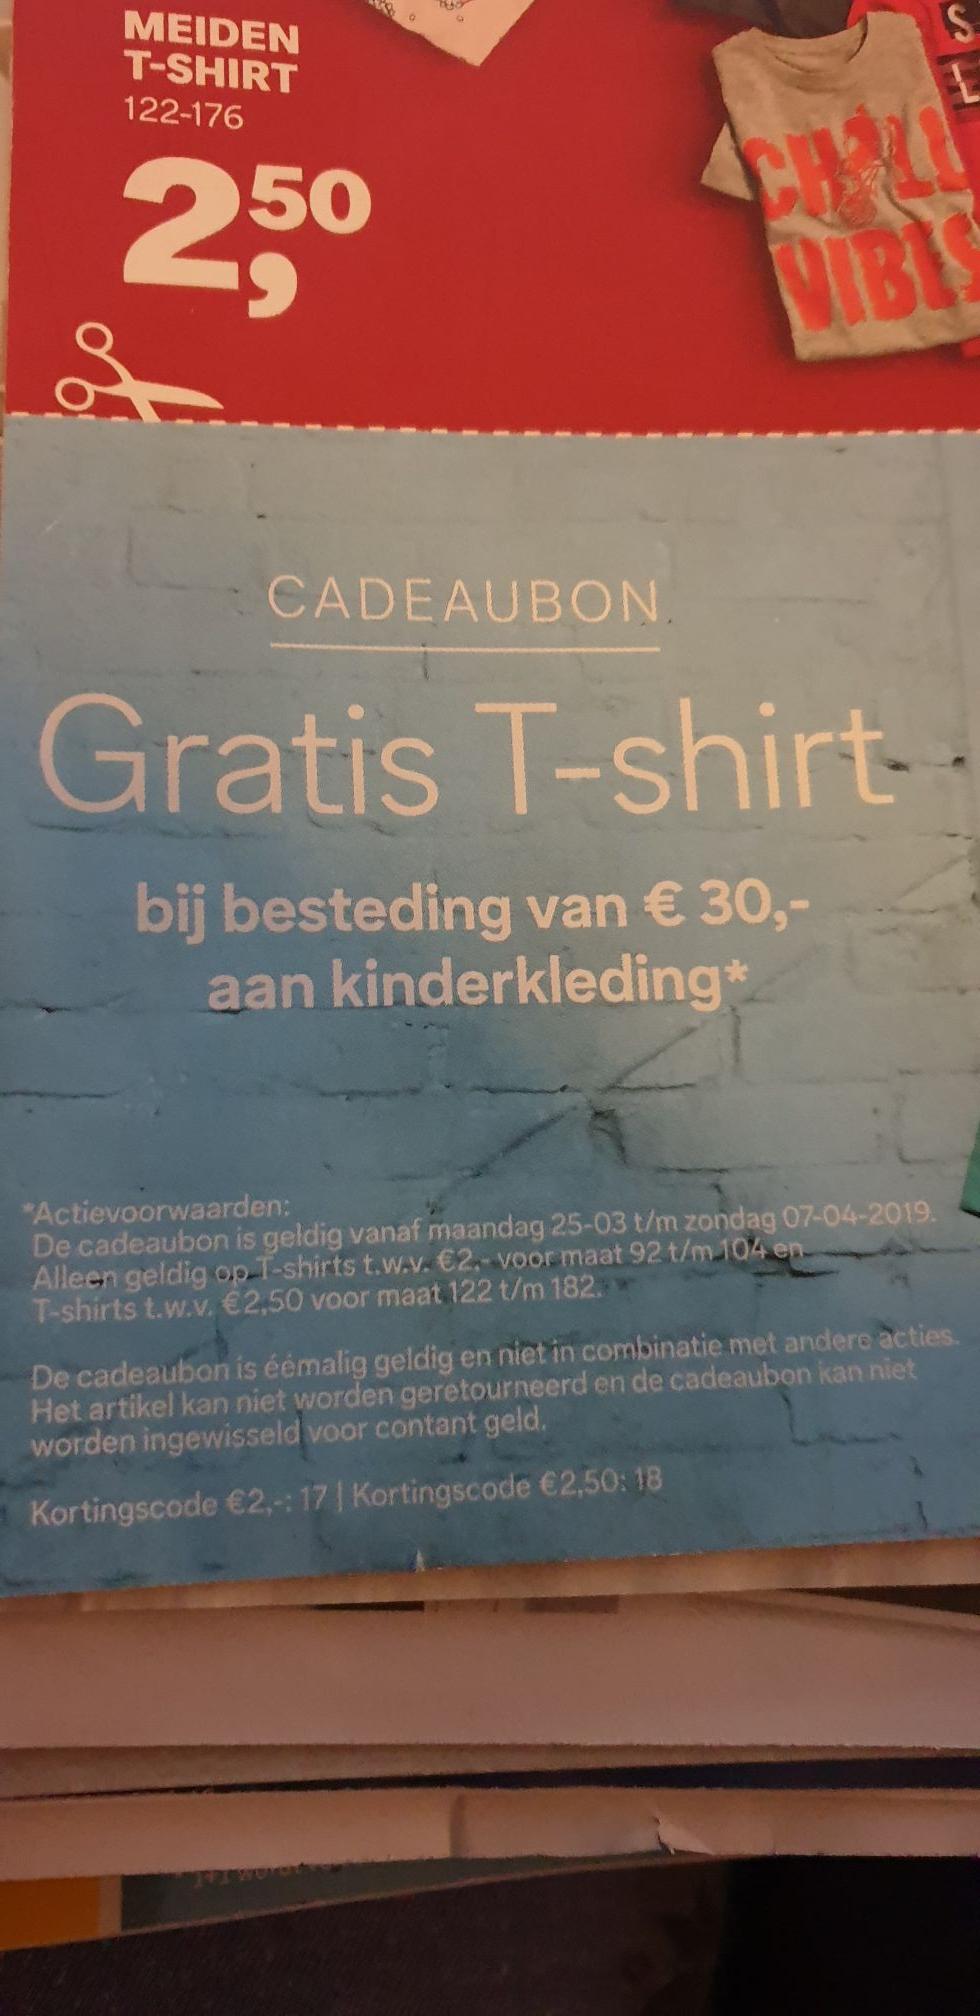 Kinderkleding Kortingscode.Gratis T Shirt Bij Besteding Van 30euro Aan Kinderkleding C A